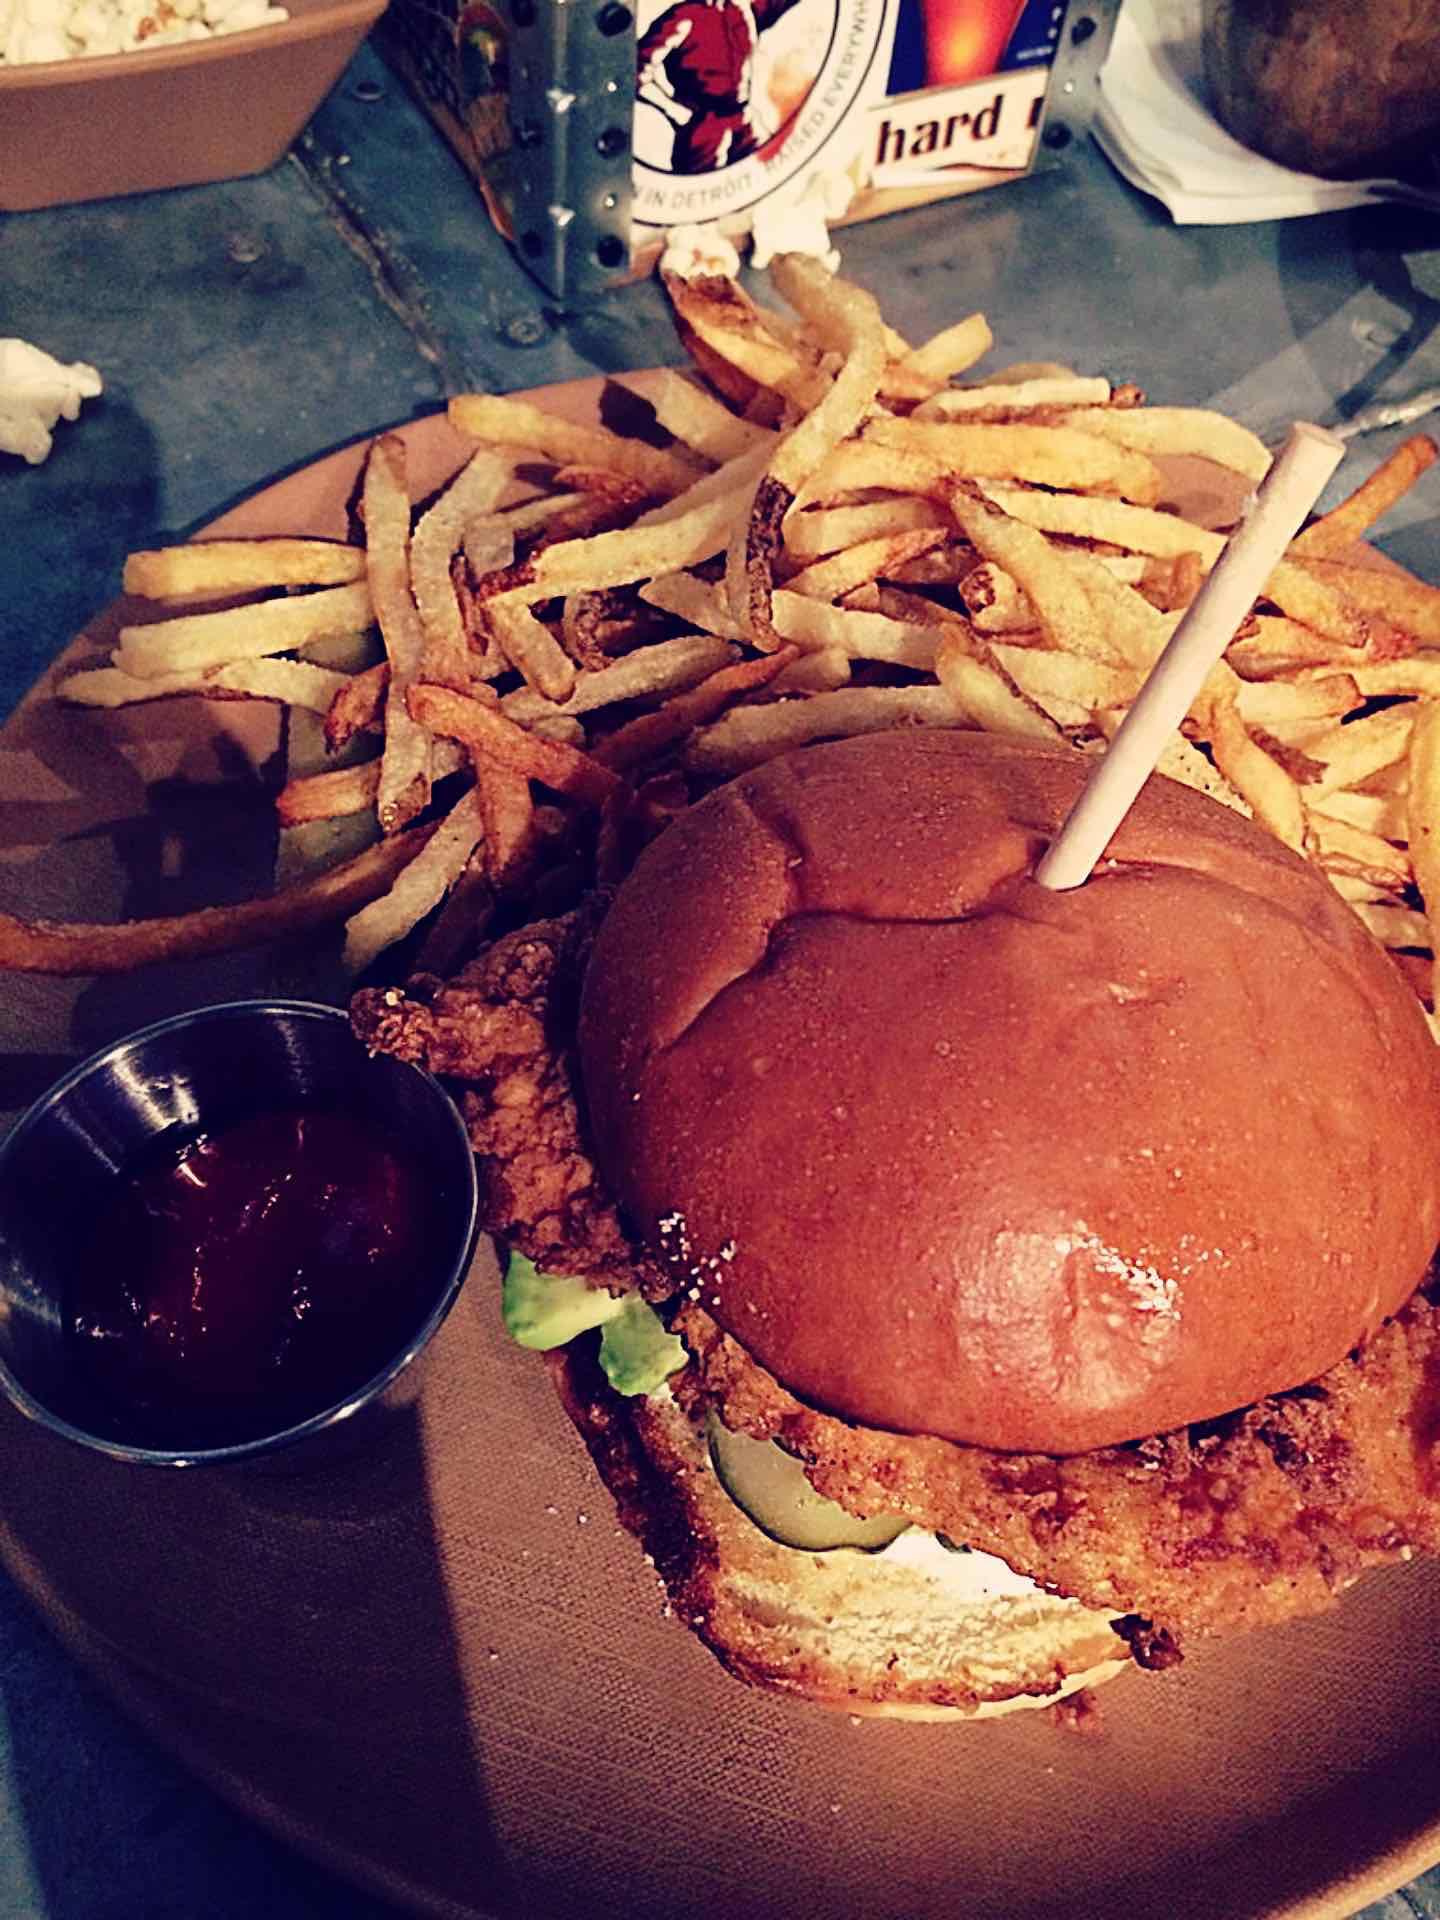 the gustavo sandwich - Kate Haritos.jpeg